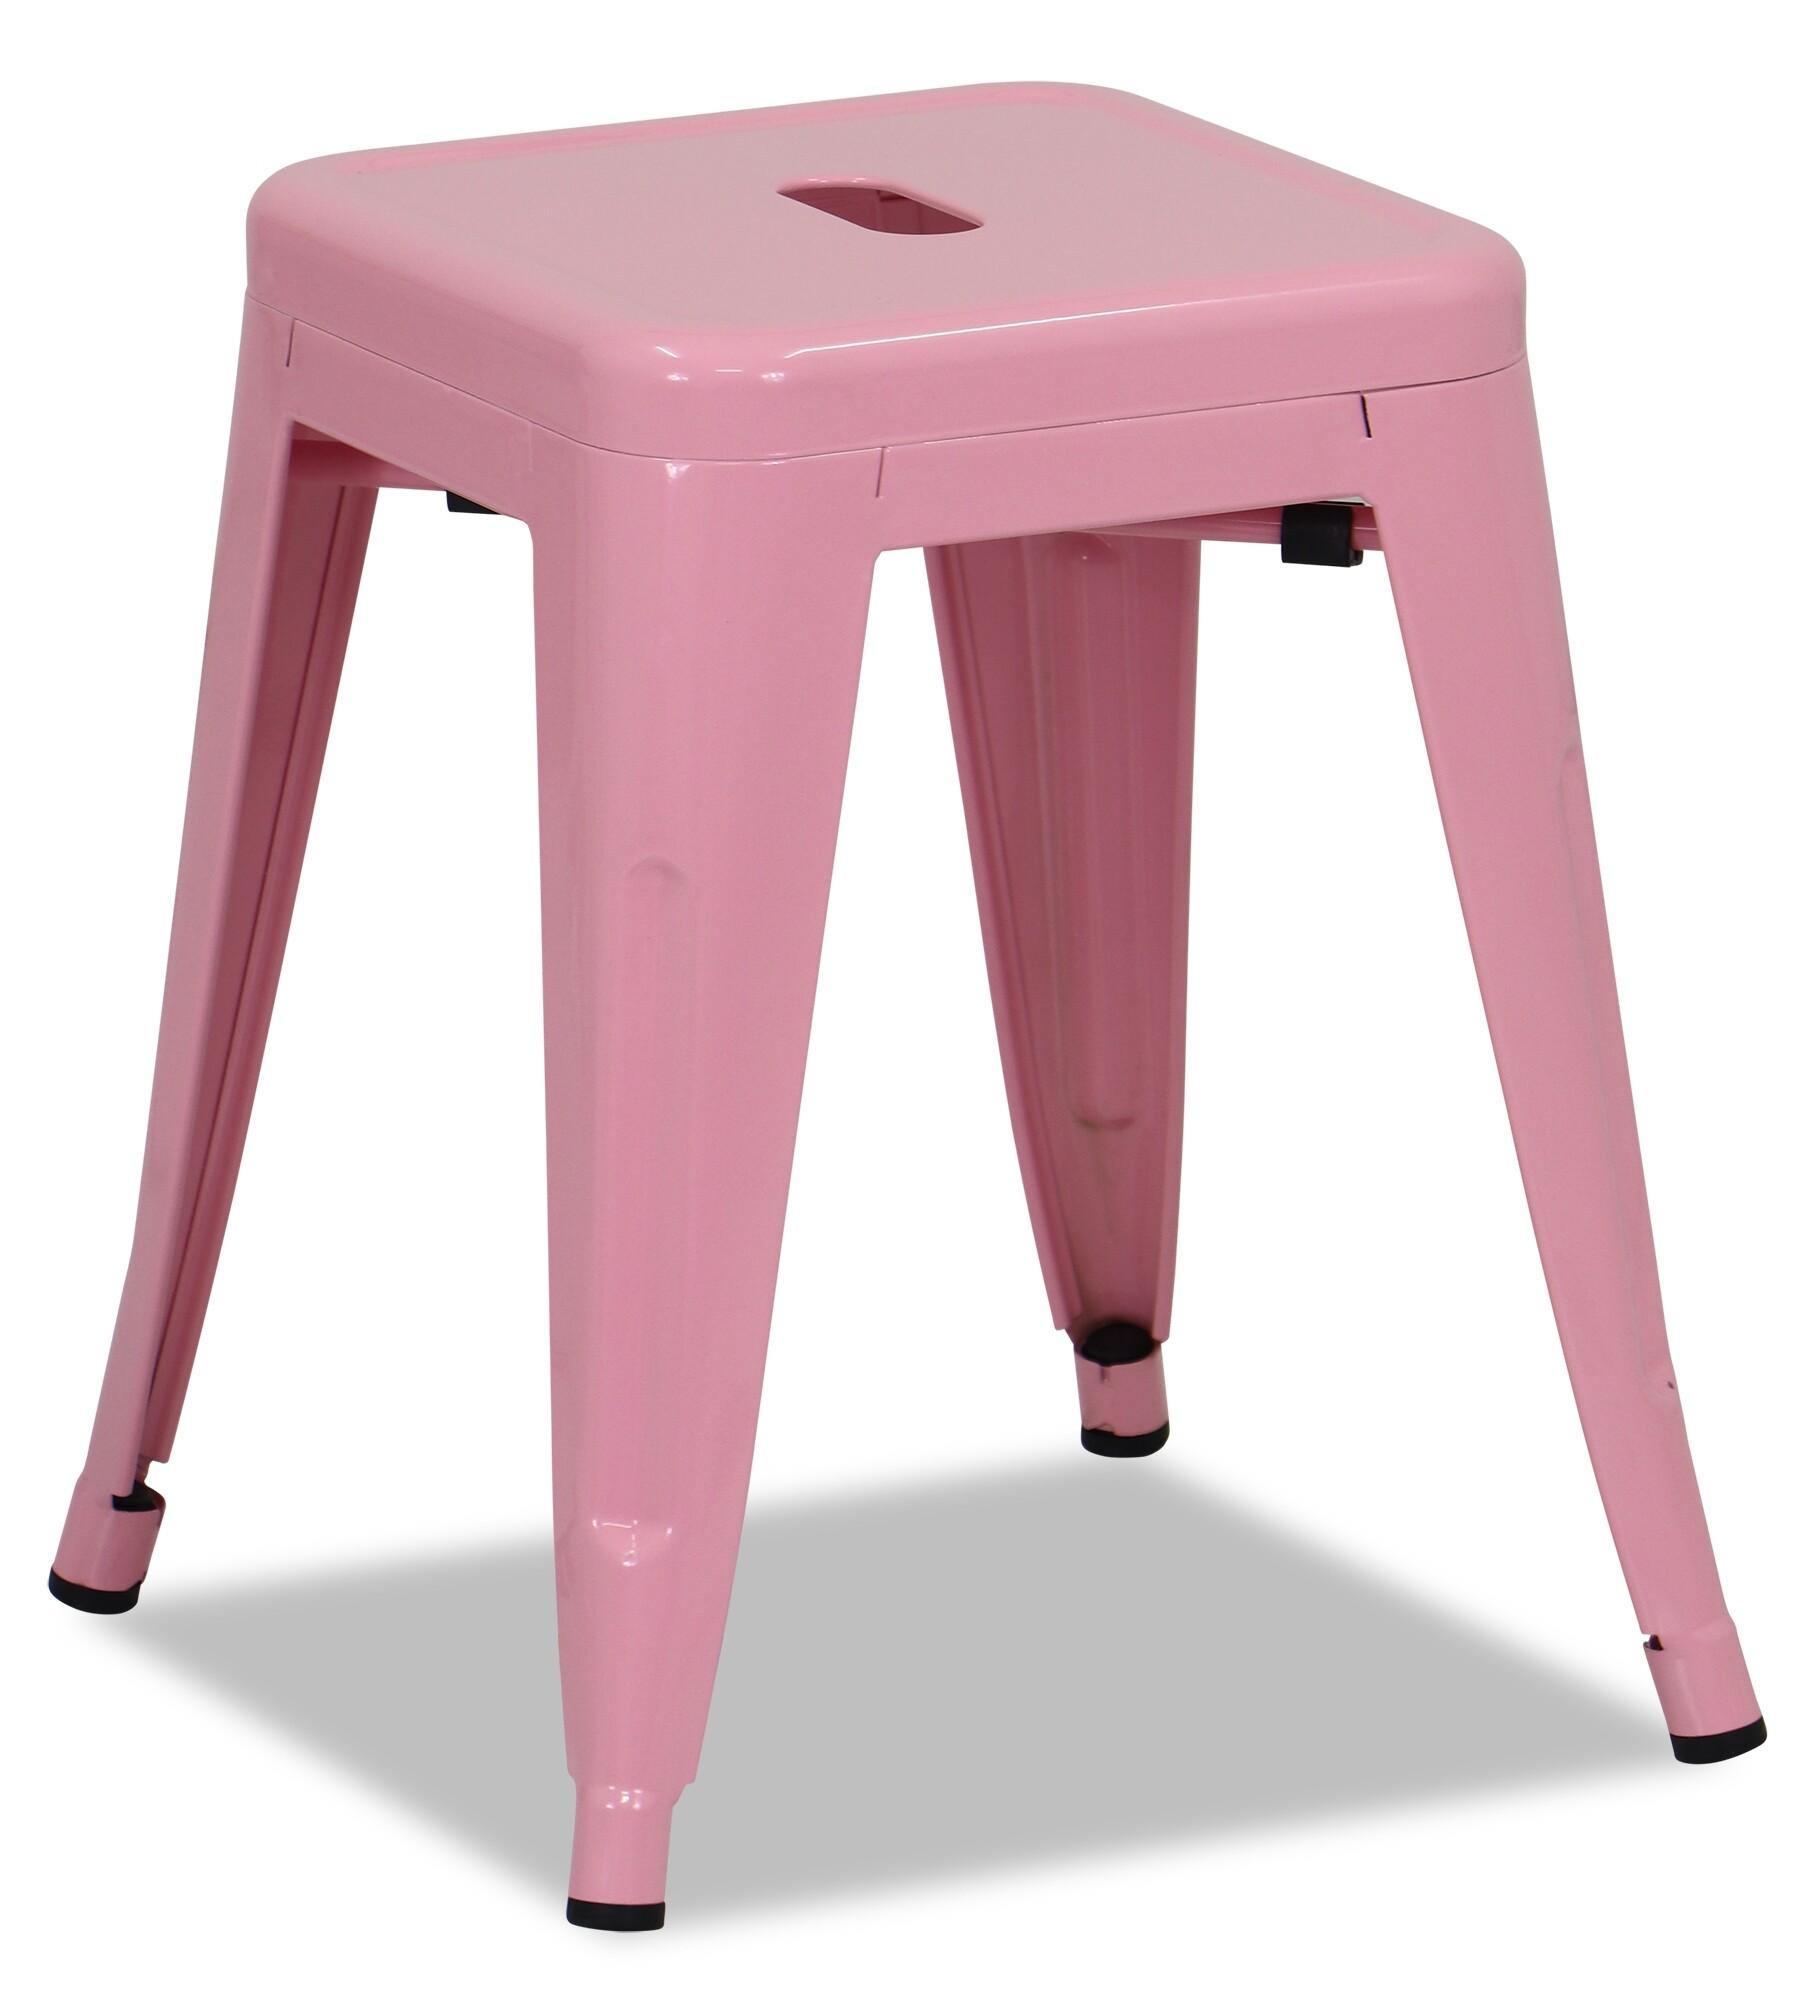 Retro Metal Regular Stool Light Pink Furniture Amp Home